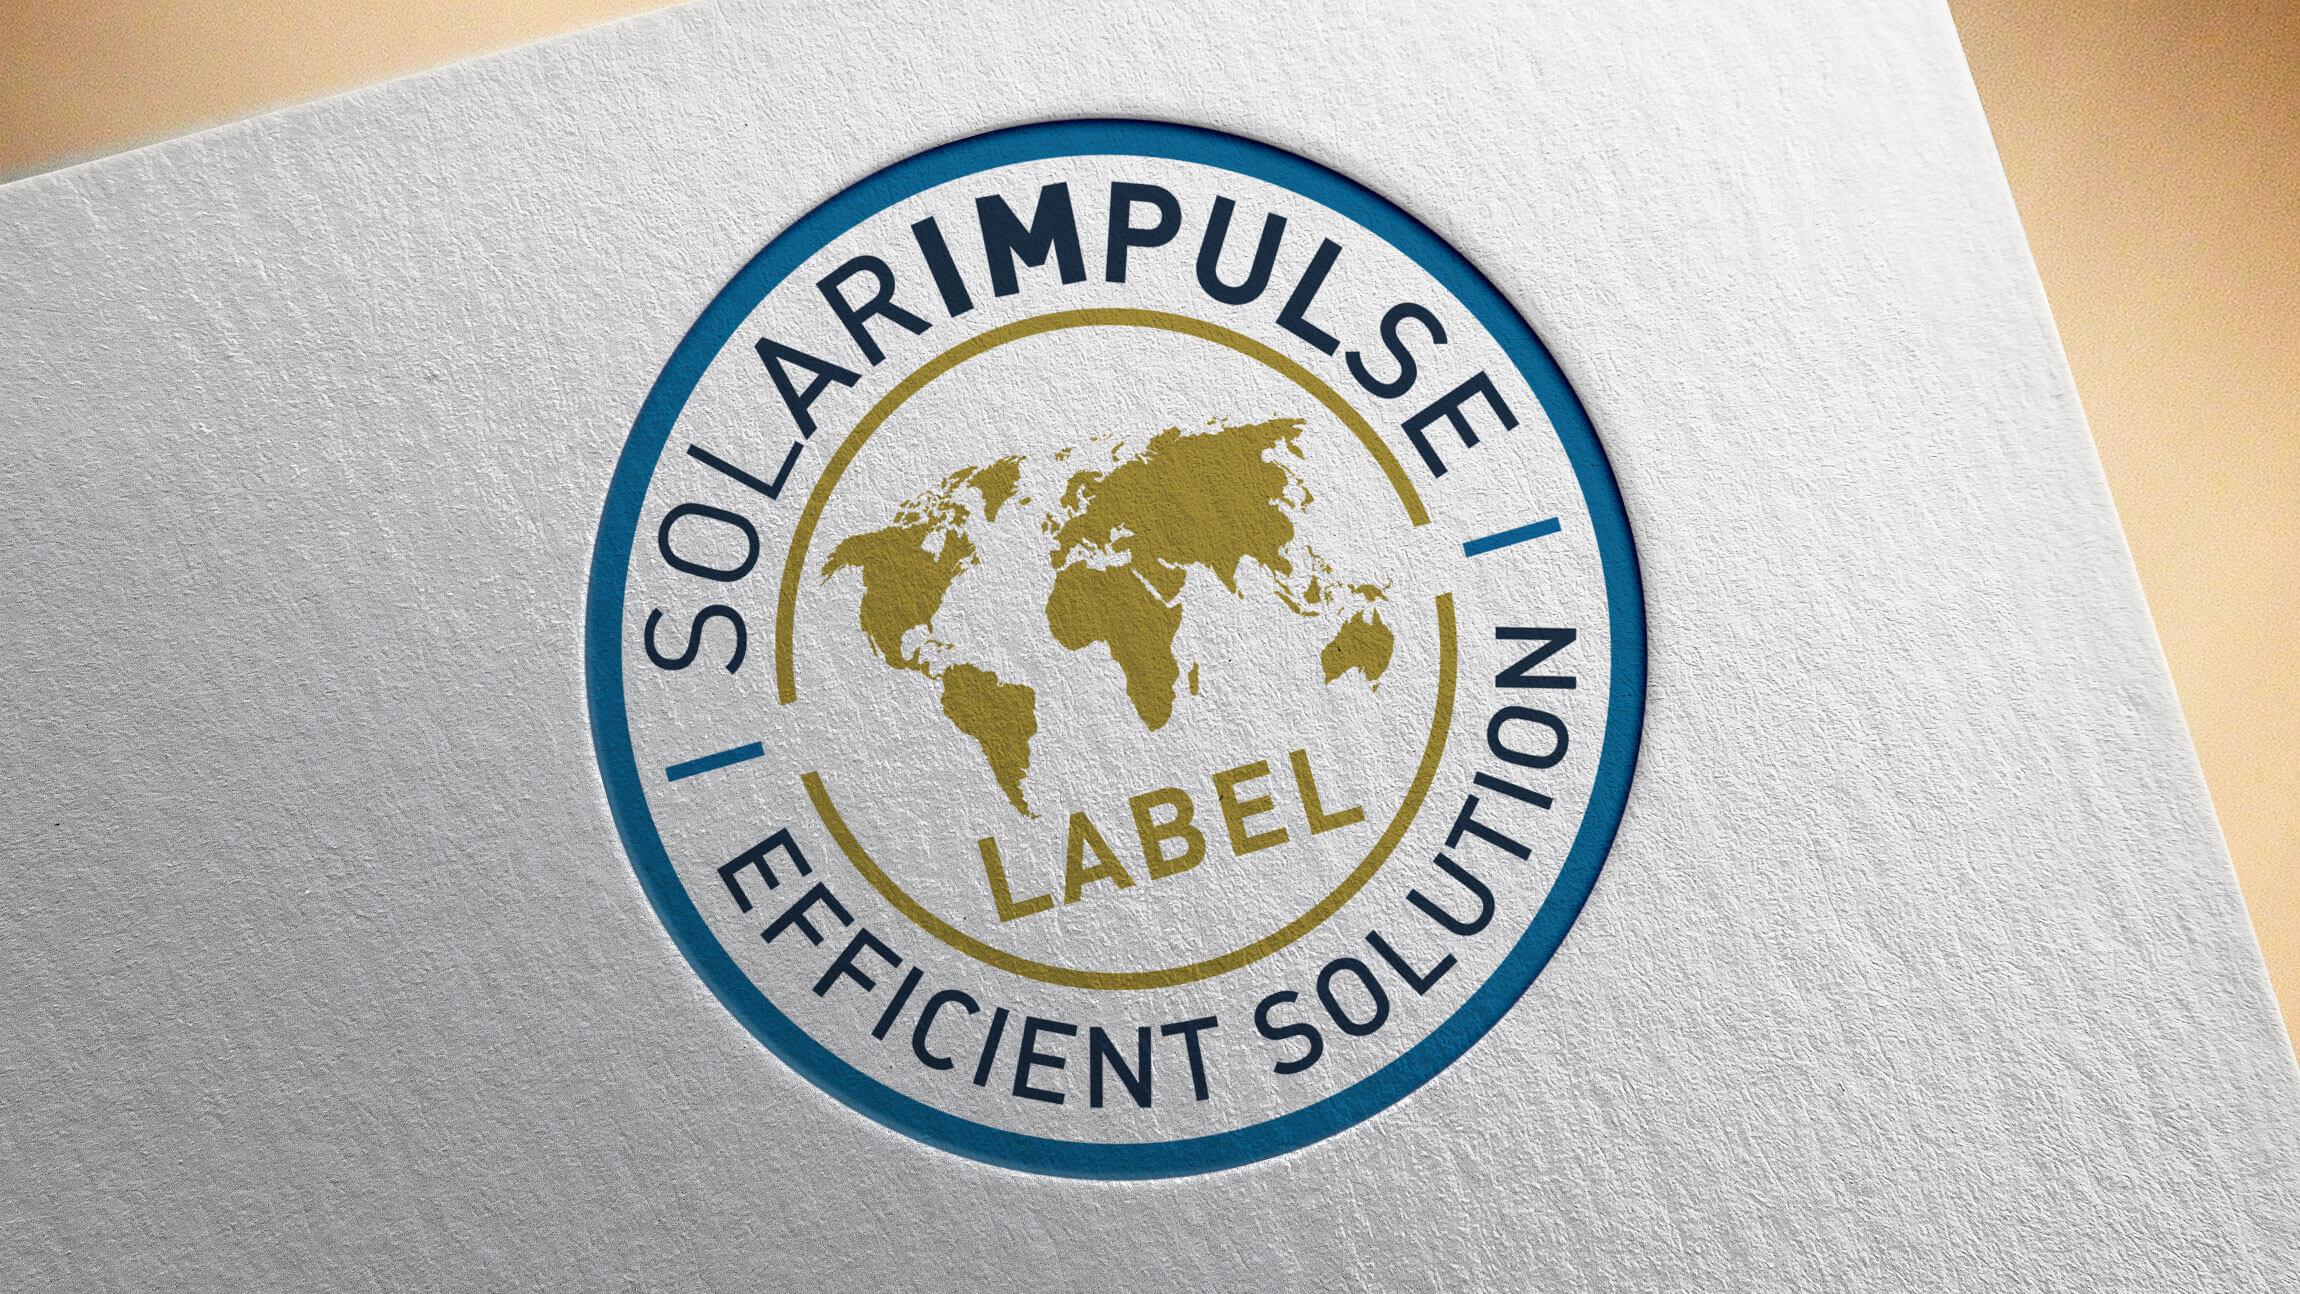 Clean Air Enterprise Solar Impulse Label